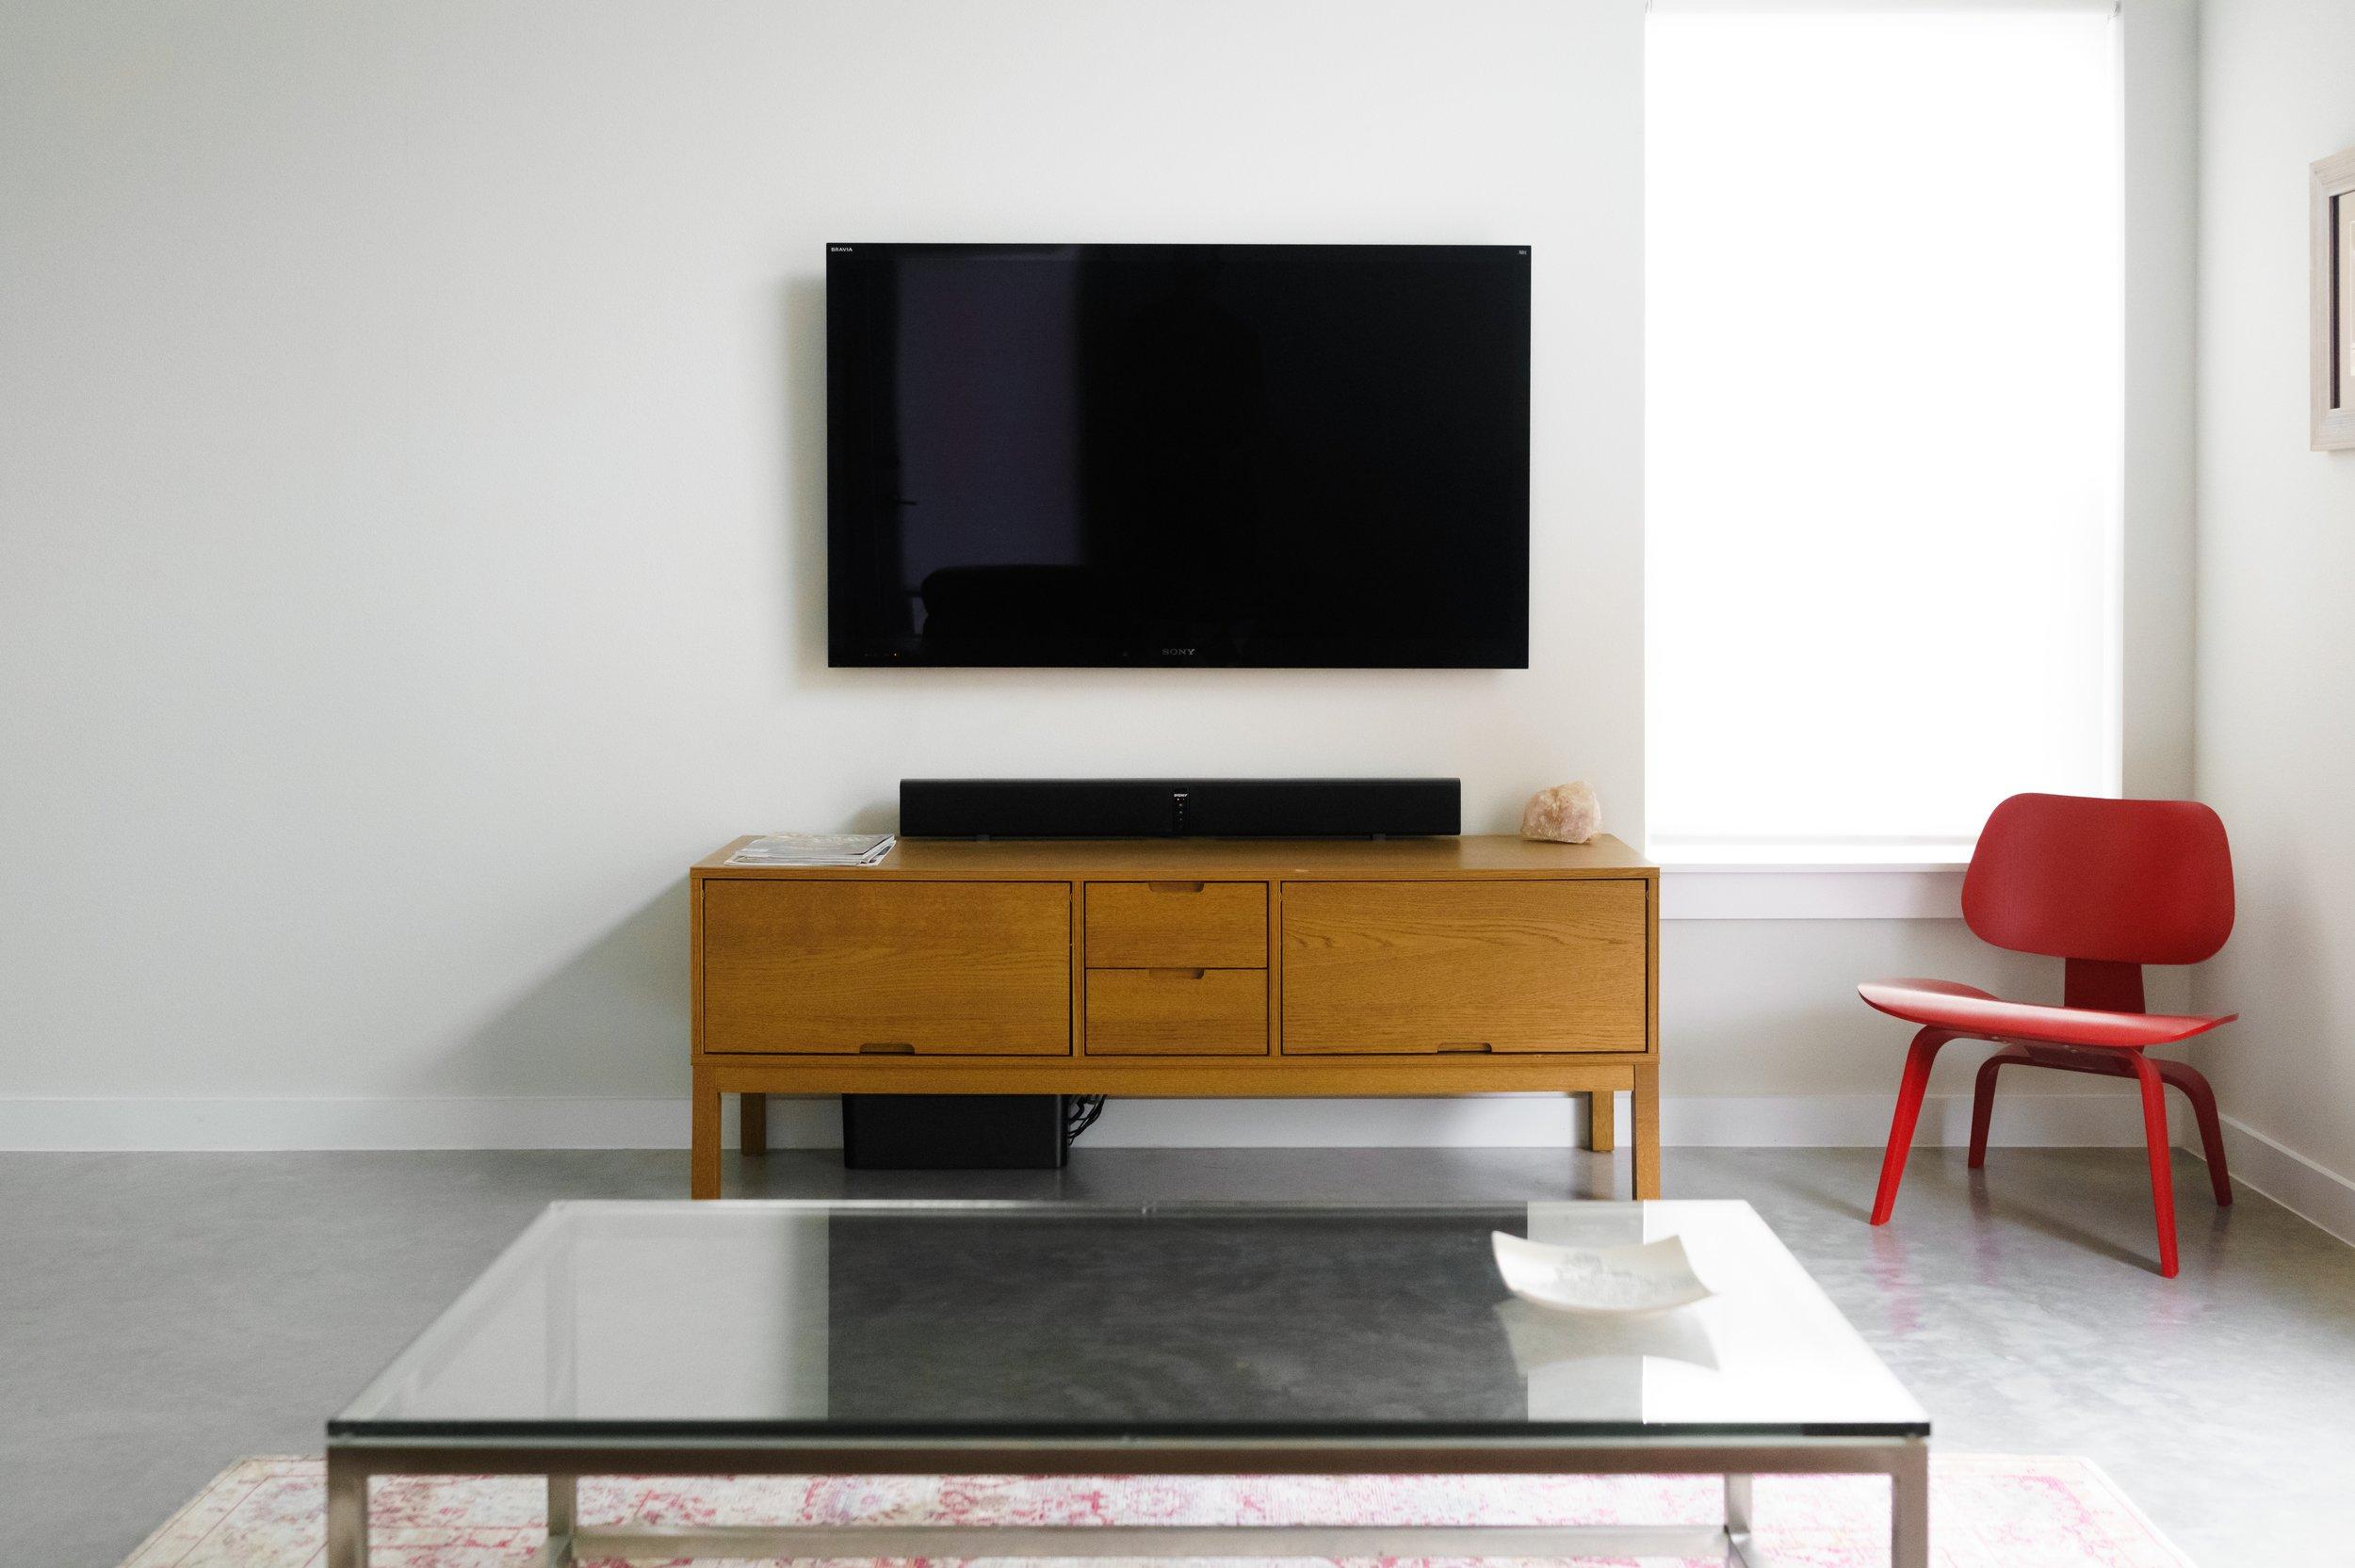 The 10 Best TV Wall Mounts